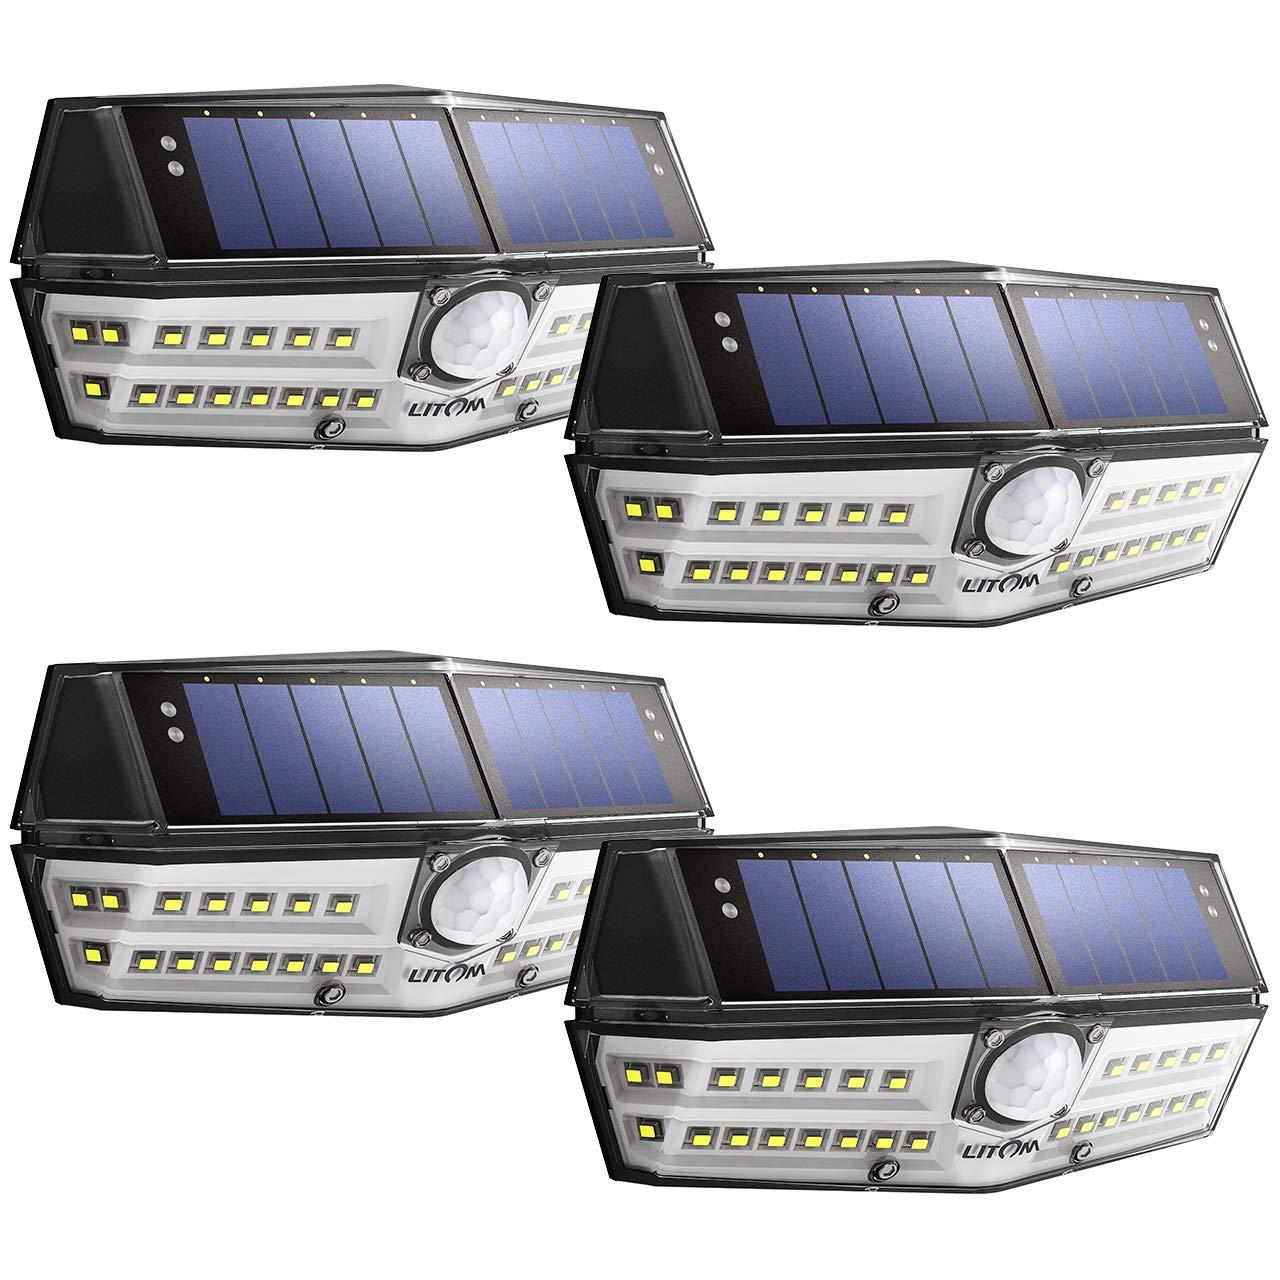 LITOM 30 LED Solar Lights Outdoor, Enhanced IP67 Waterproof Wireless Solar Motion Sensor Lights(White Light), 270°Wide Angle, Easy-to-Install Security Lights for Front Door, Yard, Garage, Deck-4 Pack